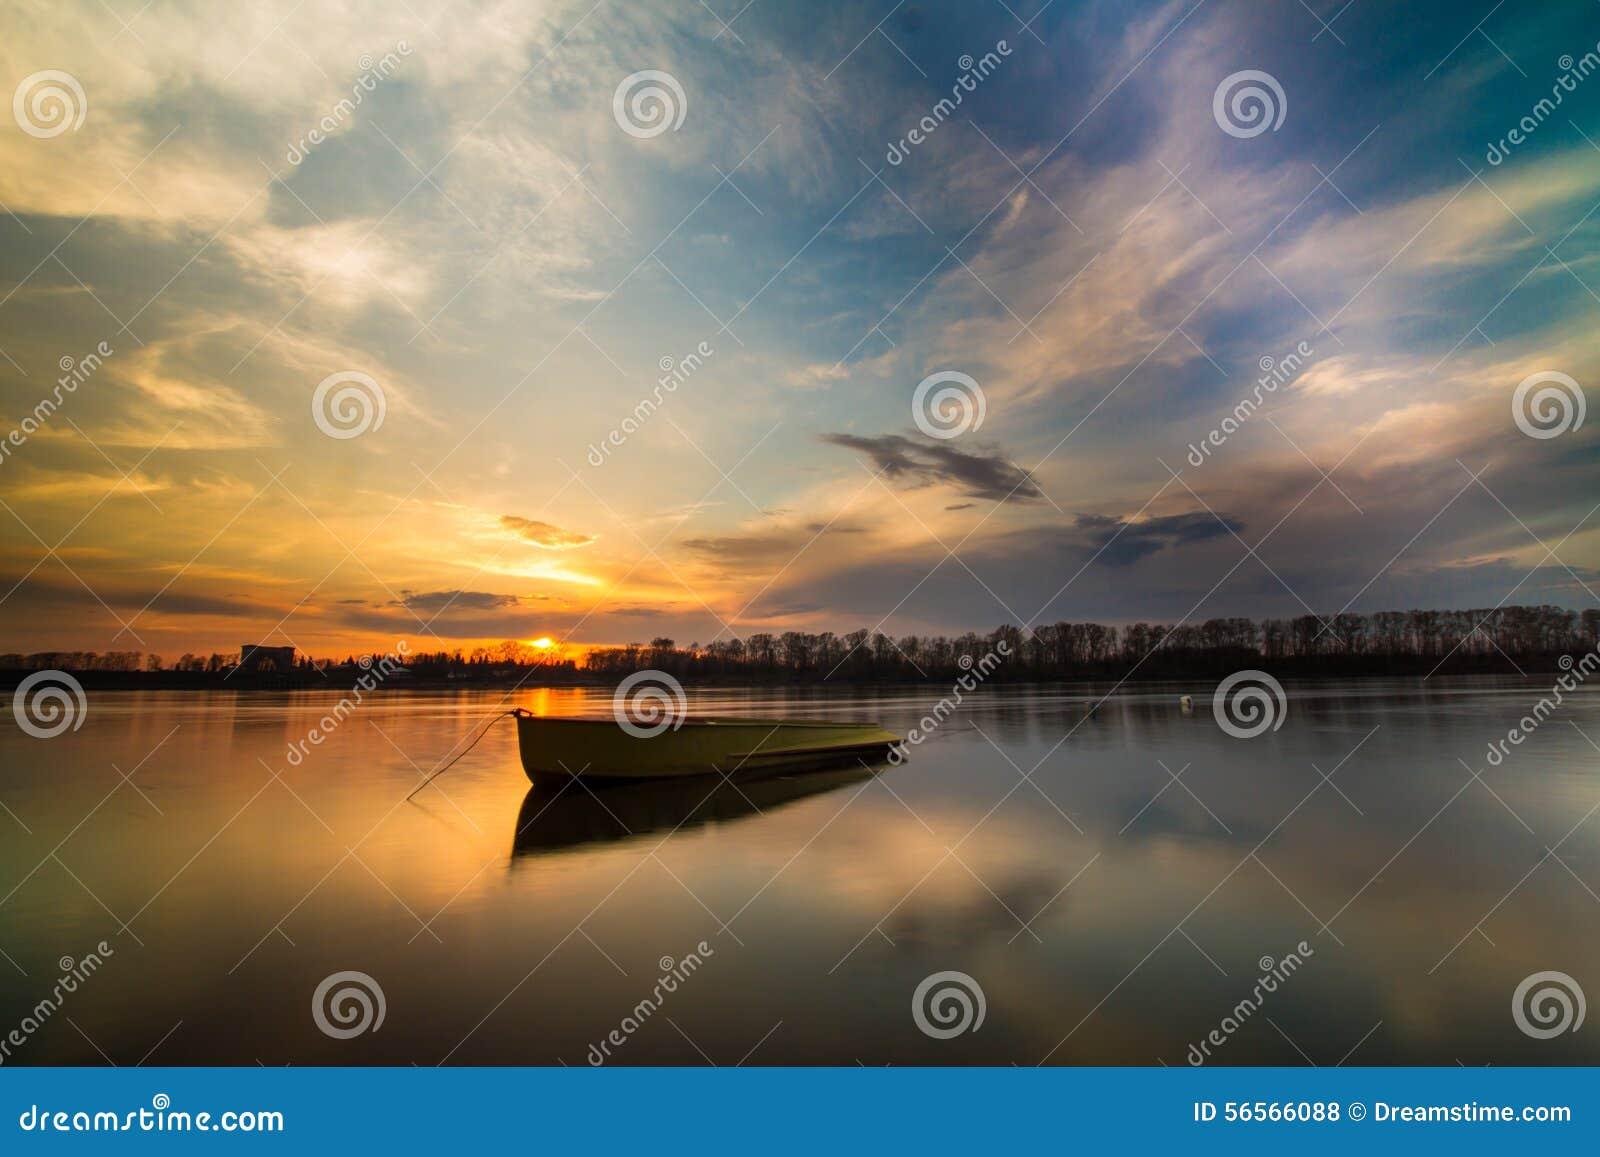 Download ηρεμία στοκ εικόνες. εικόνα από ηλιοβασίλεμα, μπορέστε - 56566088